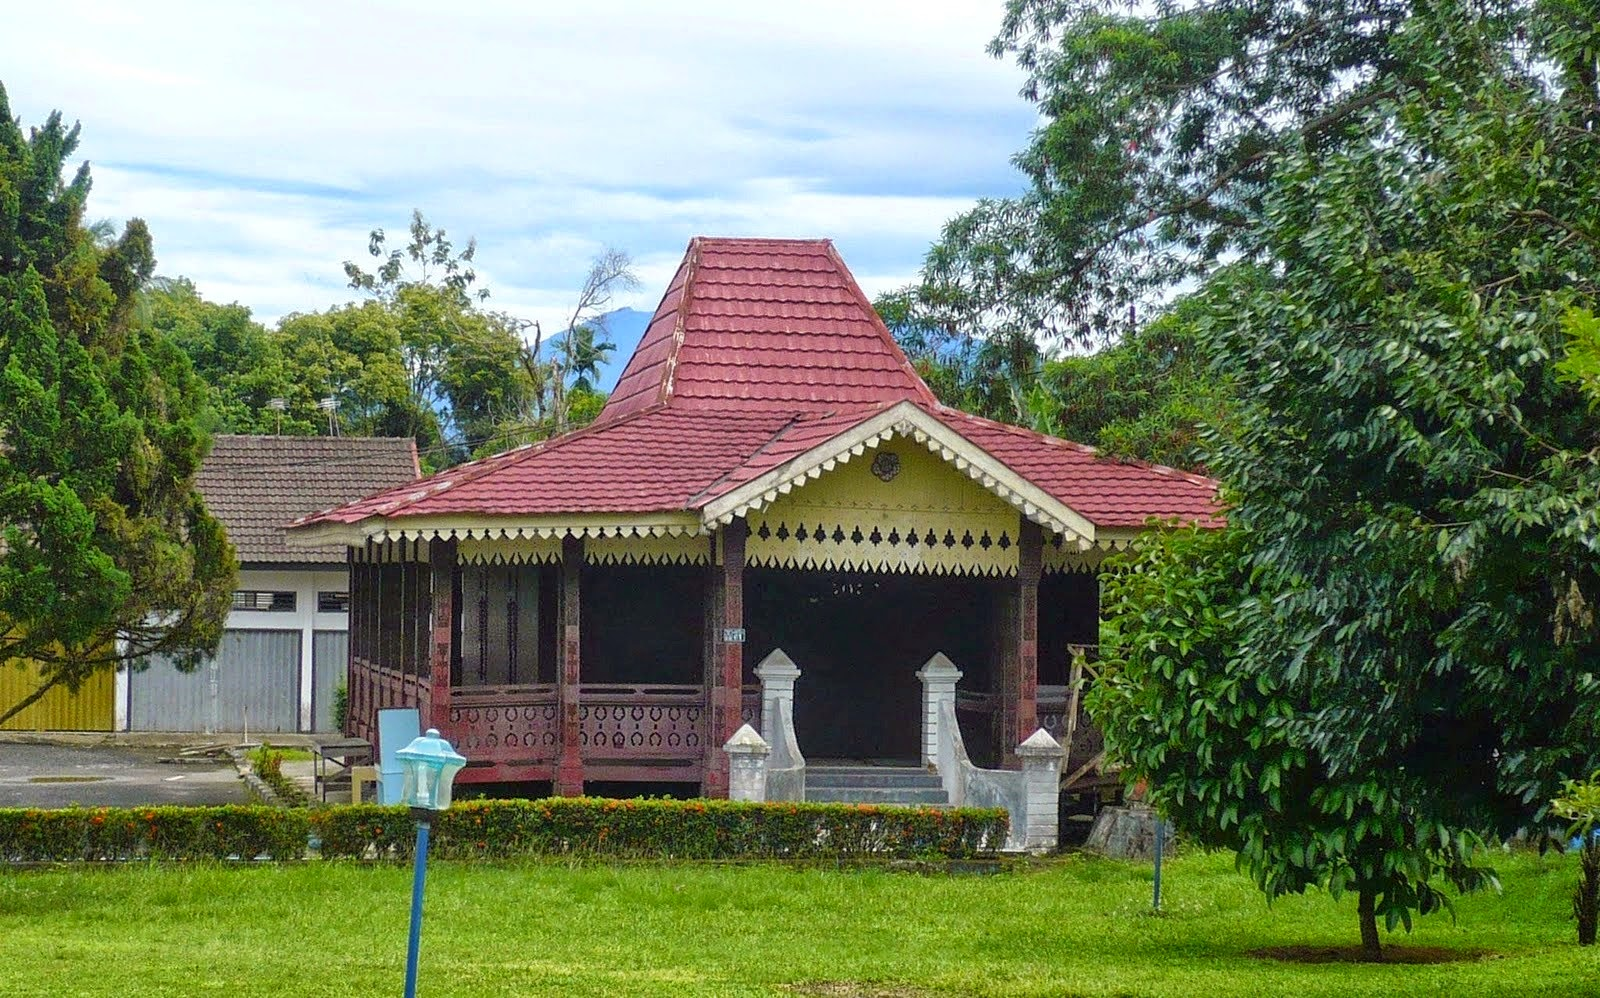 Rumah Adat Tradisional Lengkap Beserta Gambar Dari Setiap